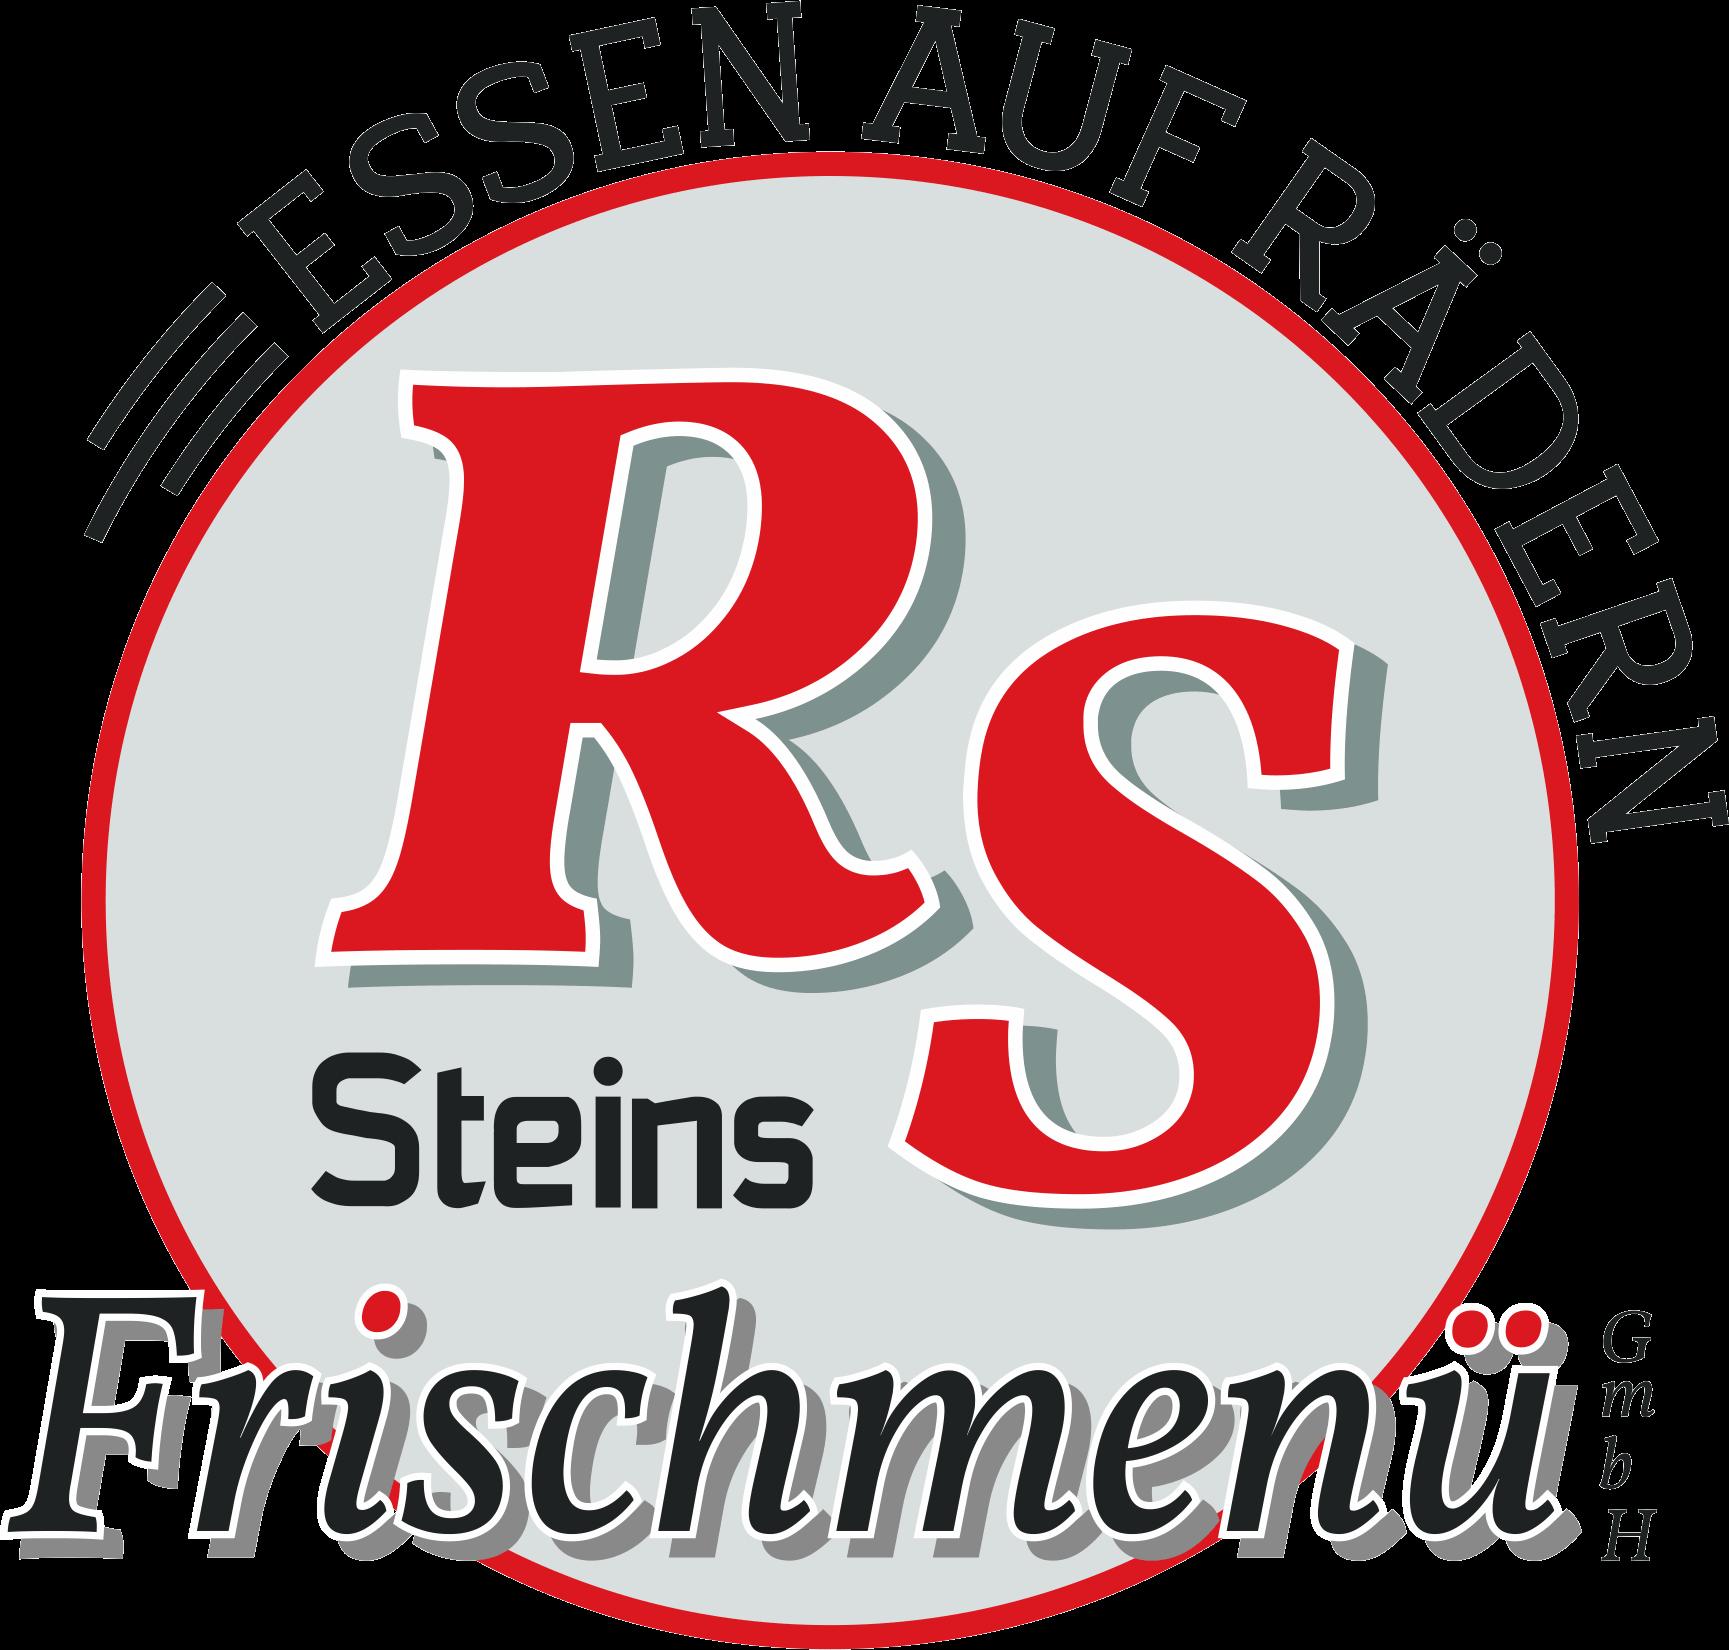 Frischmenü